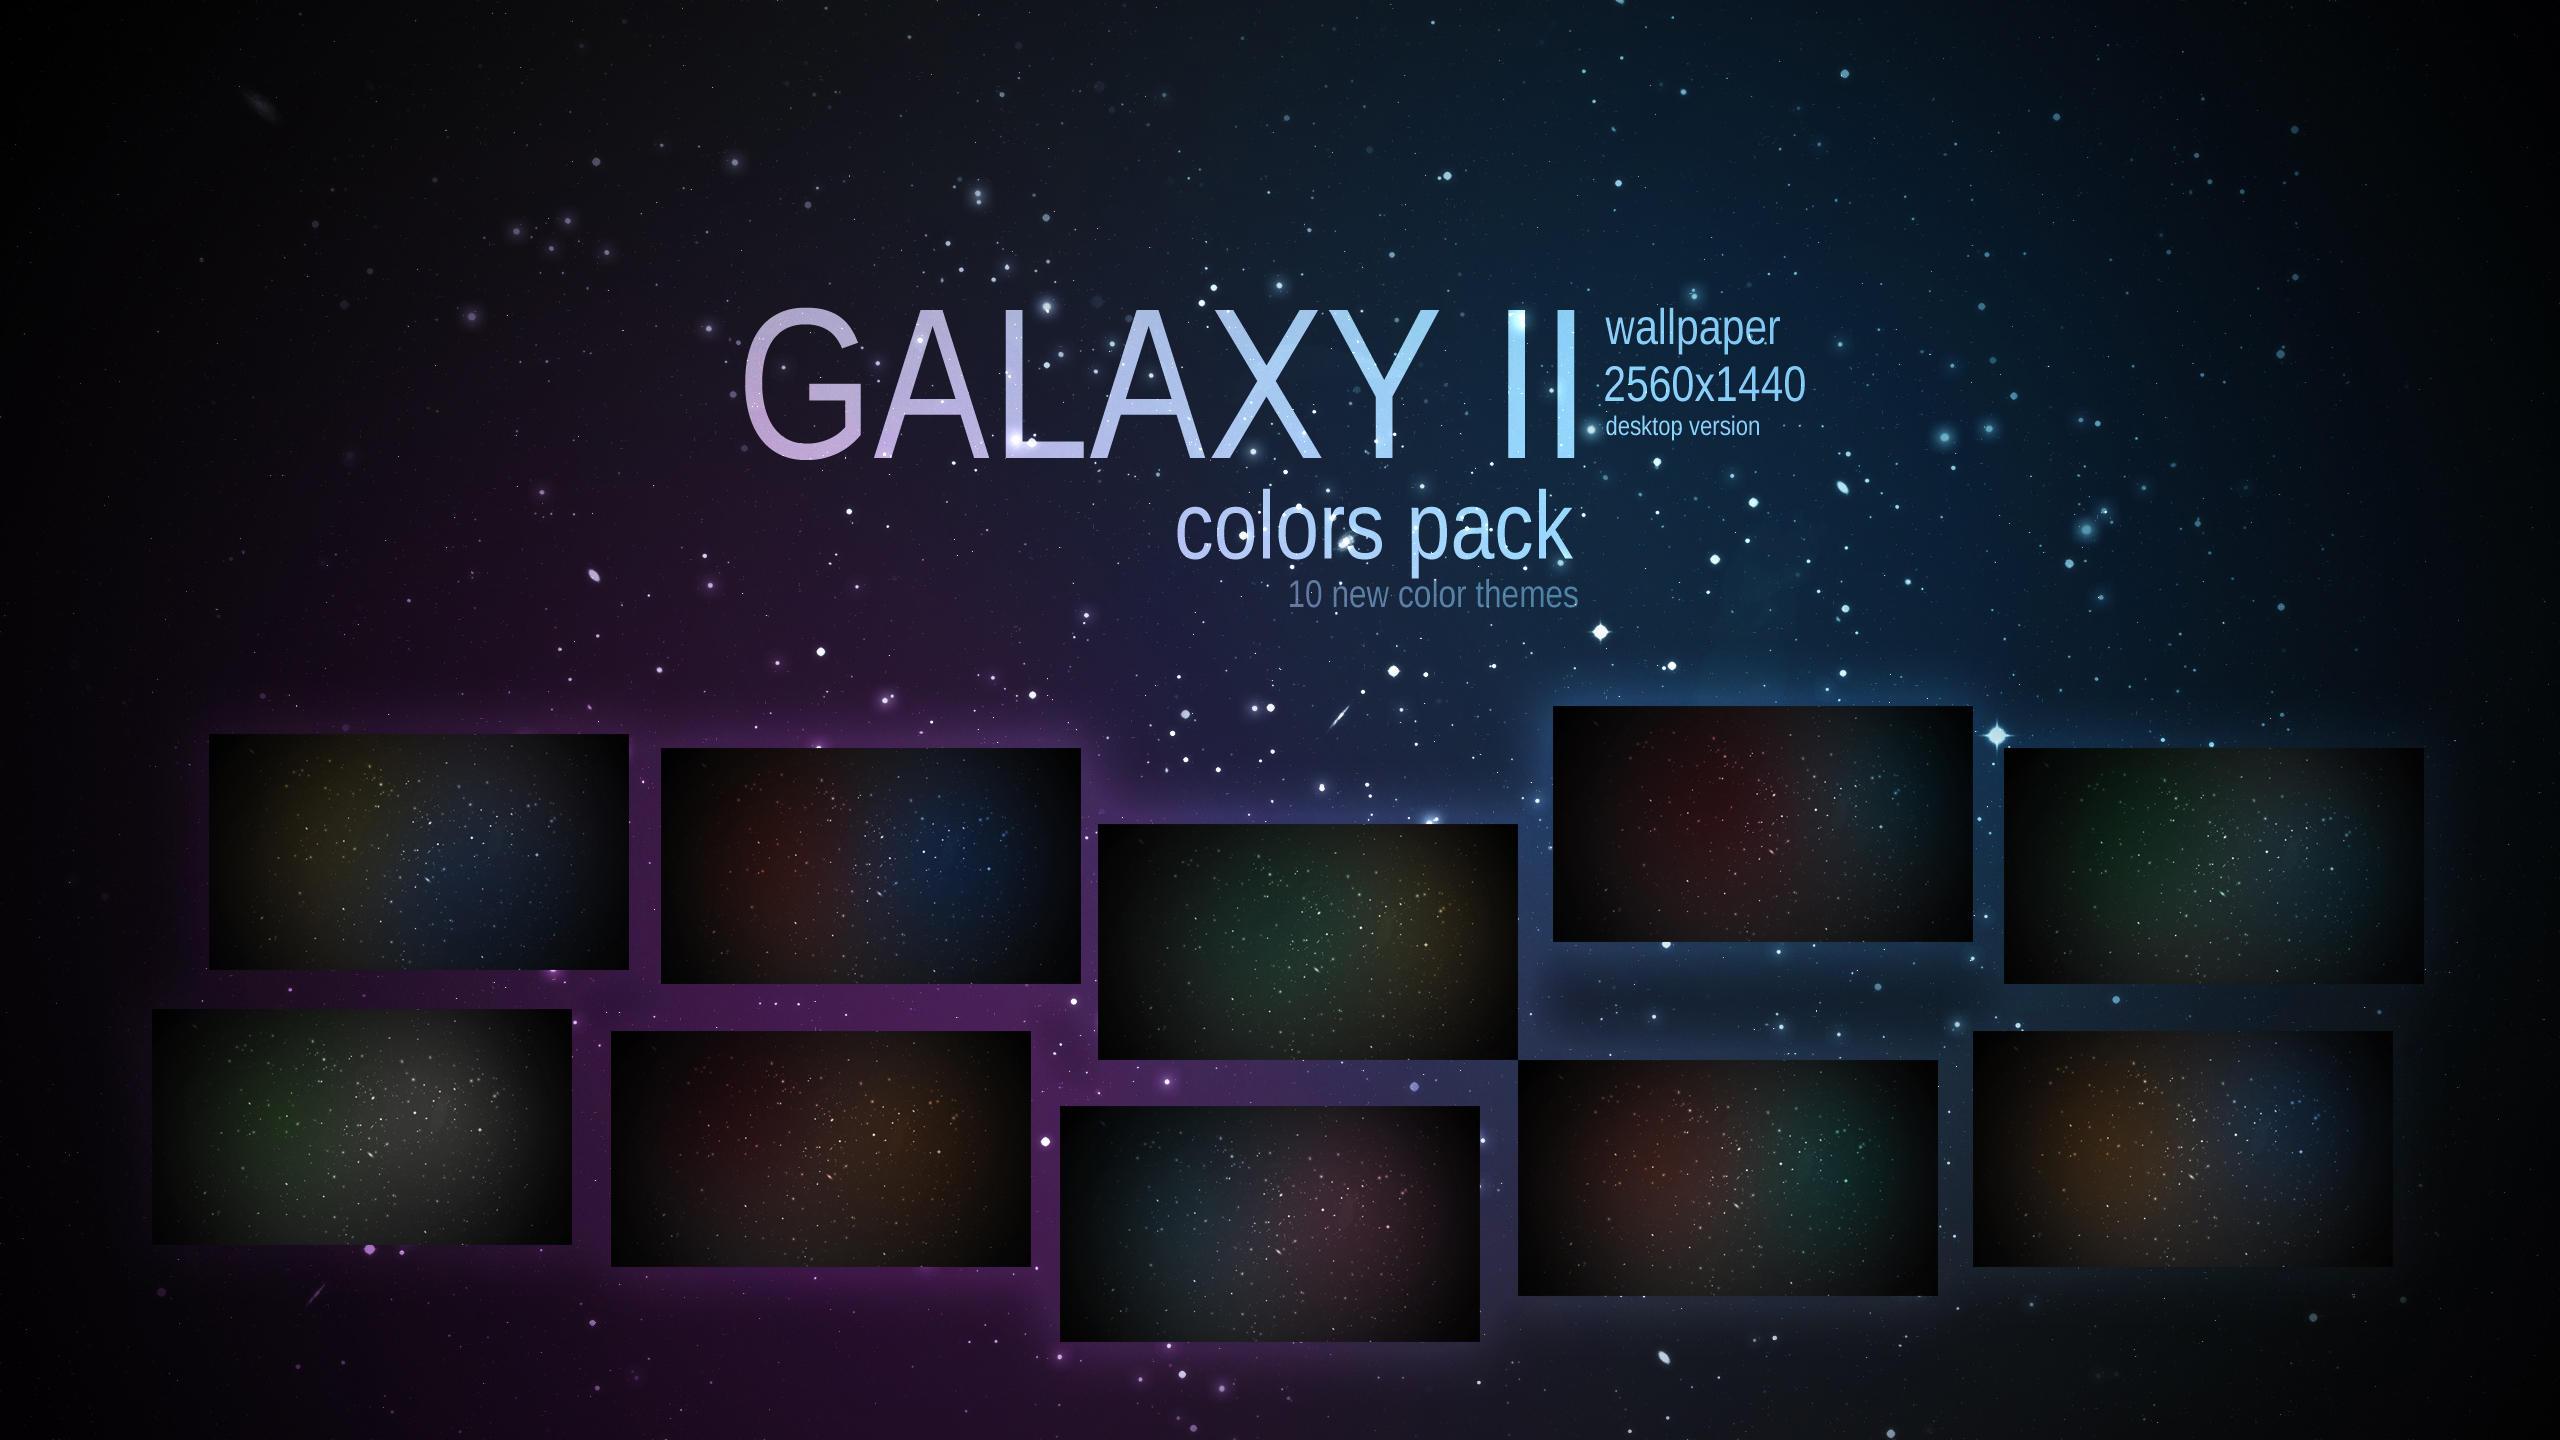 Galaxy II Wallpaper Colors Pack by Martz90